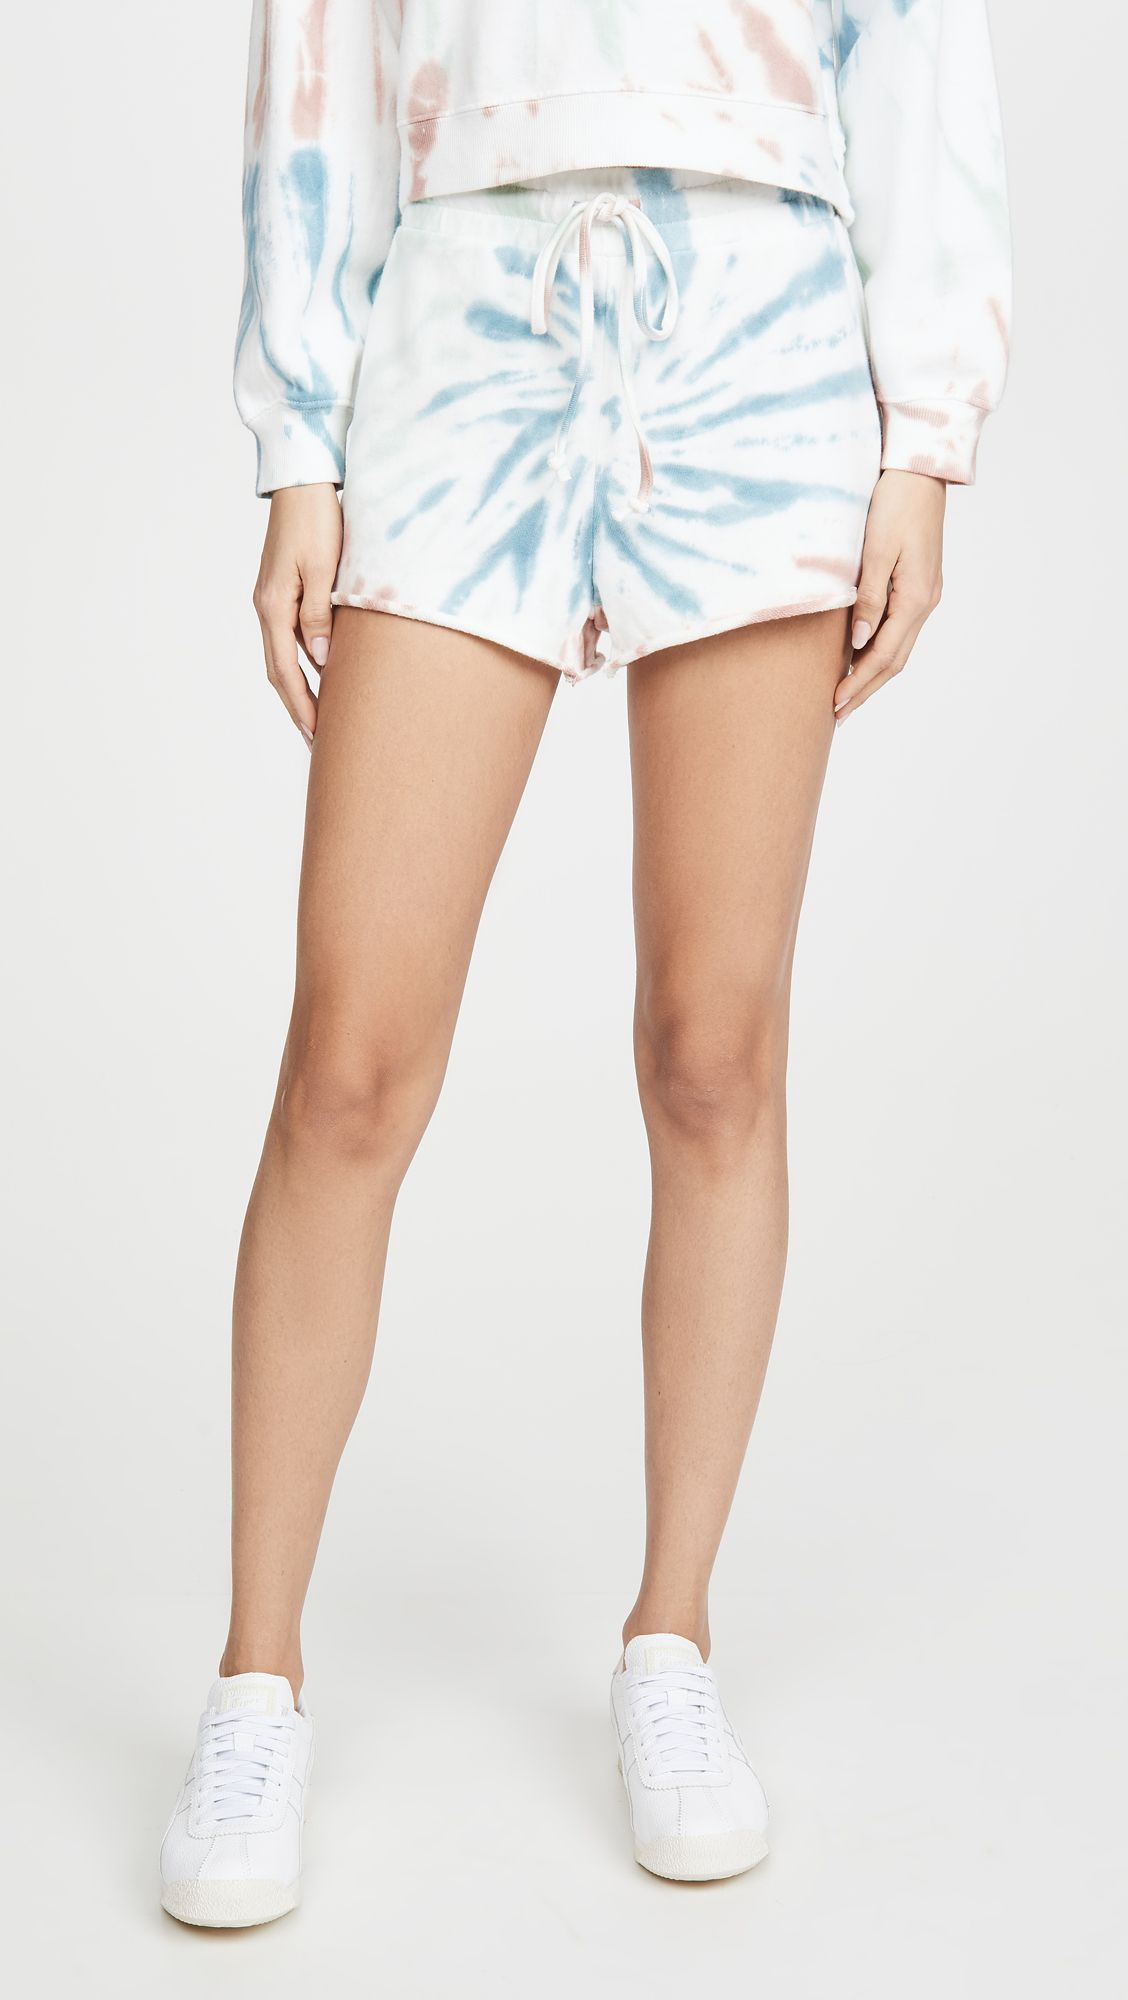 Nina Dobrev's Tie-Dye Matching Set Is Absolutely My Next Purchase 3